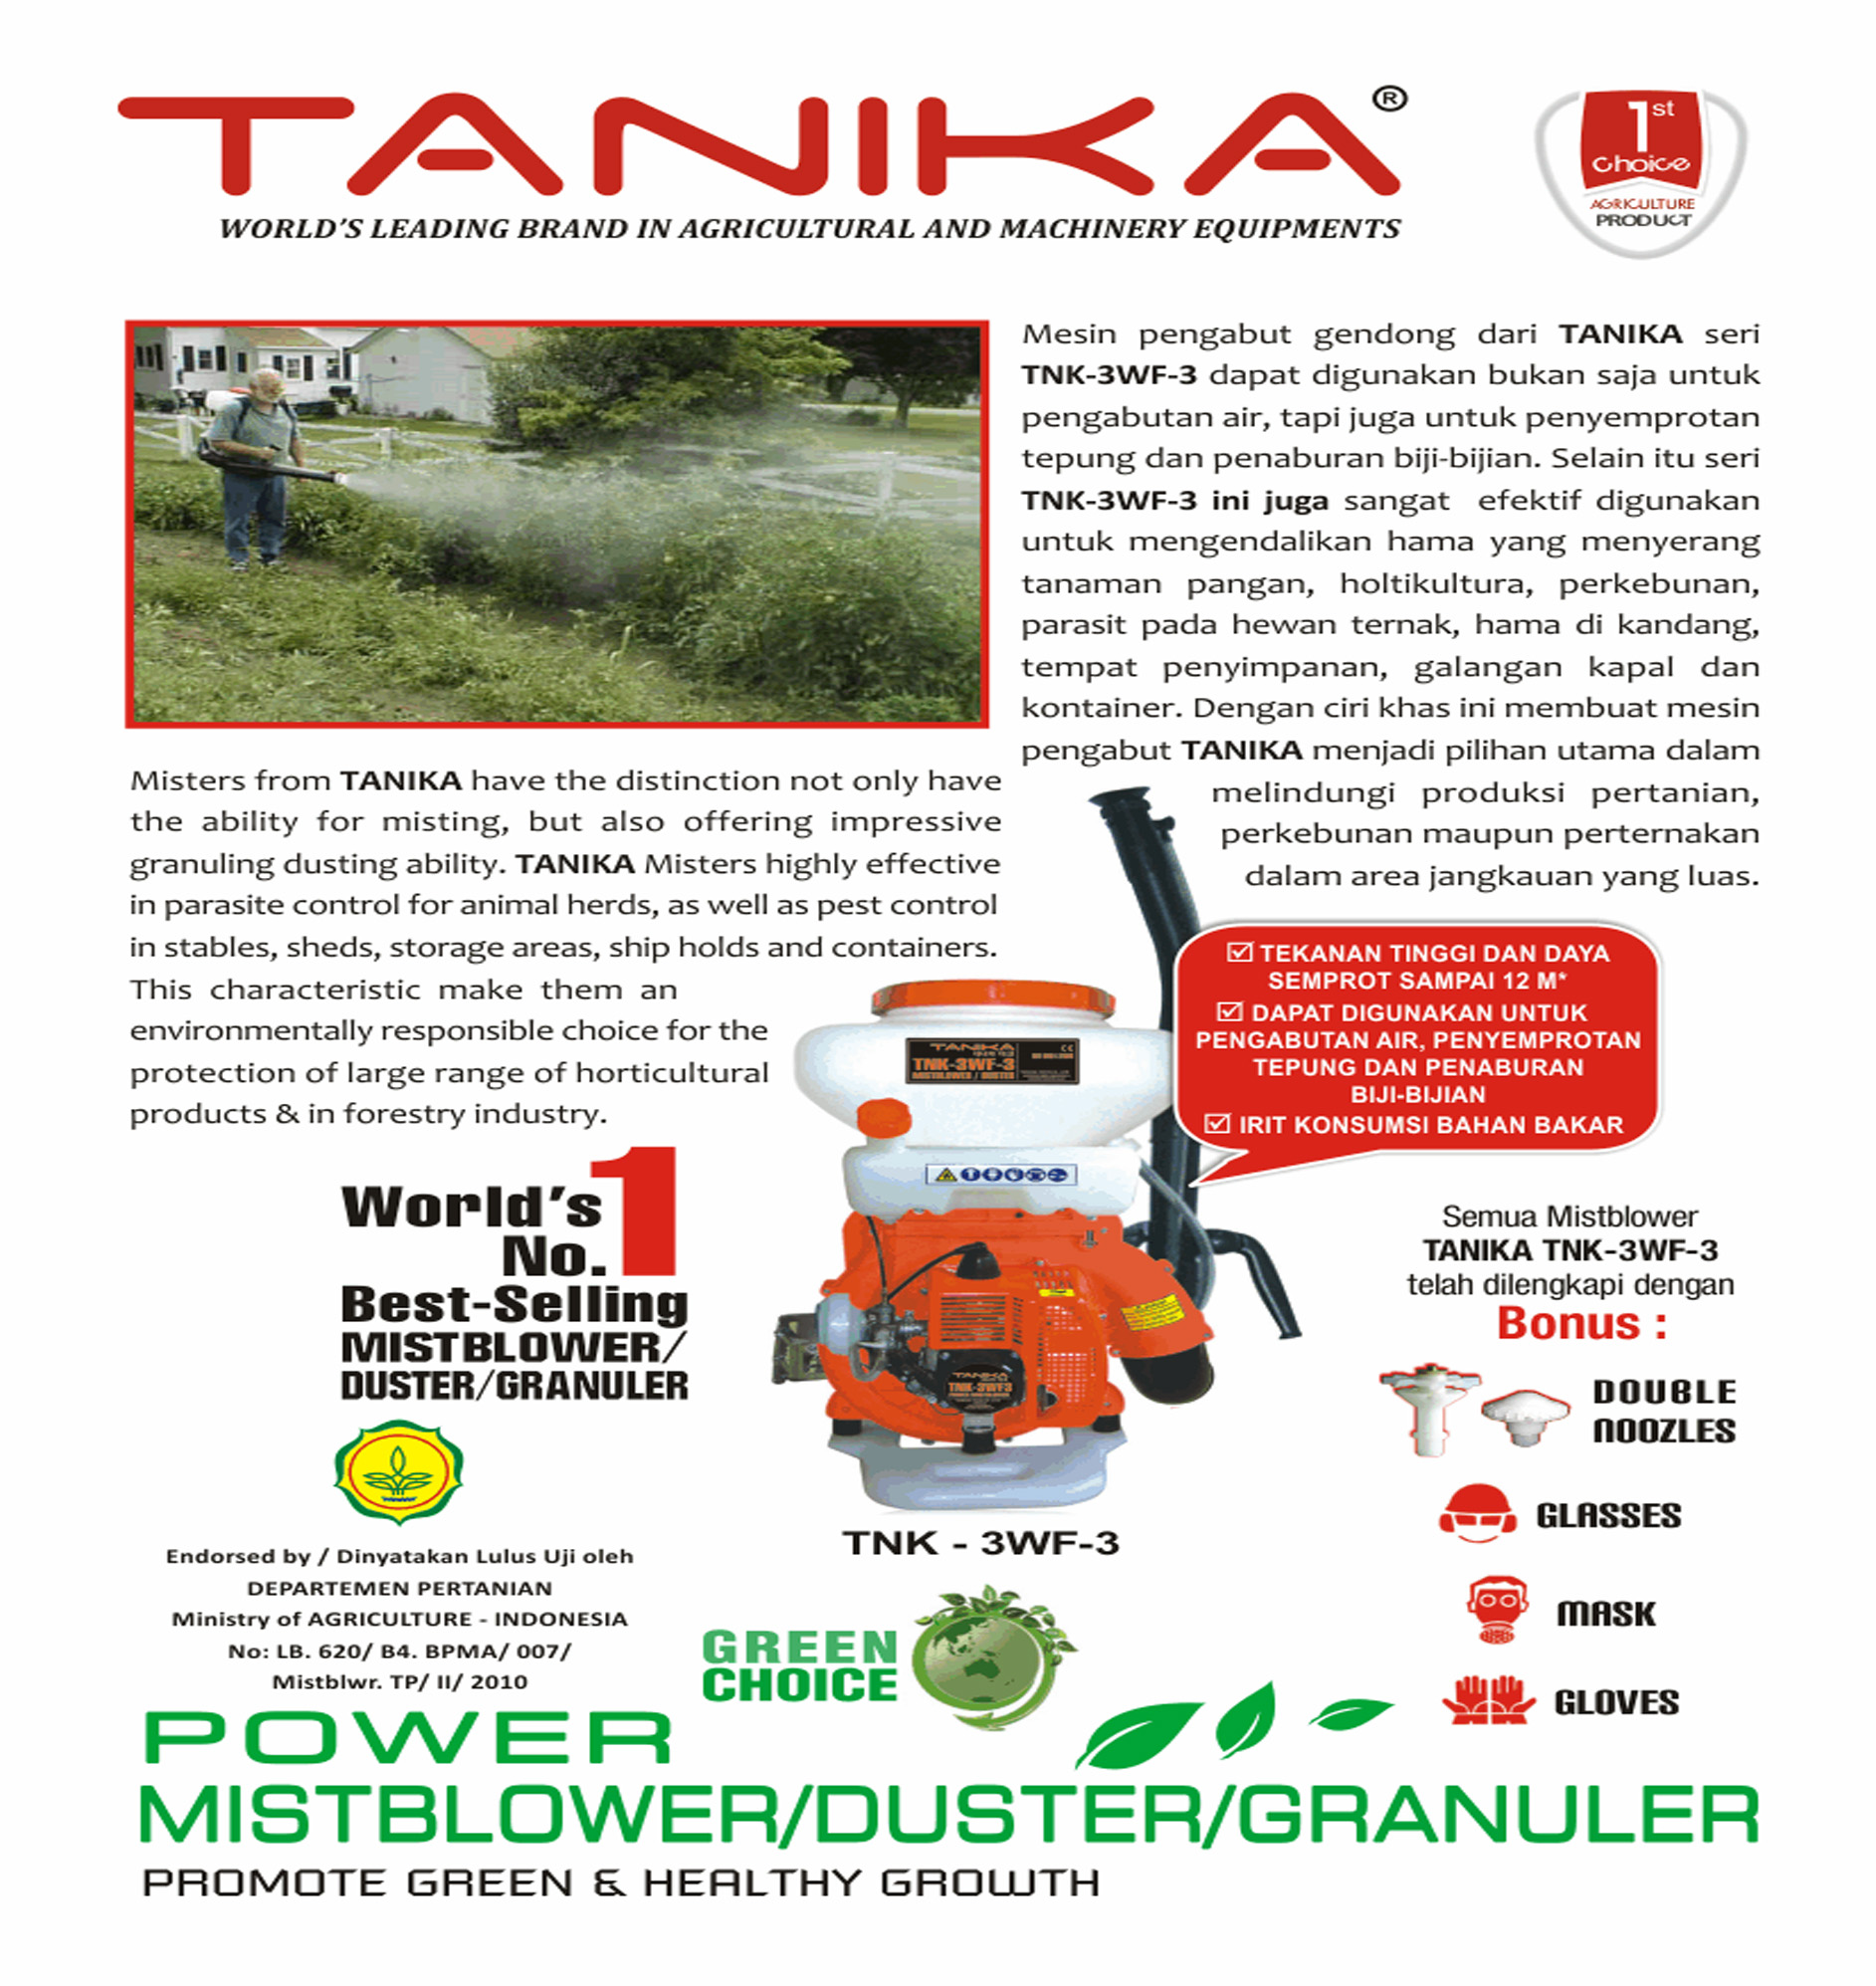 Tanika Spesifikasi Produk Tnk Wf Trei Mistblower Mesin Semprot Pengabut Gendong